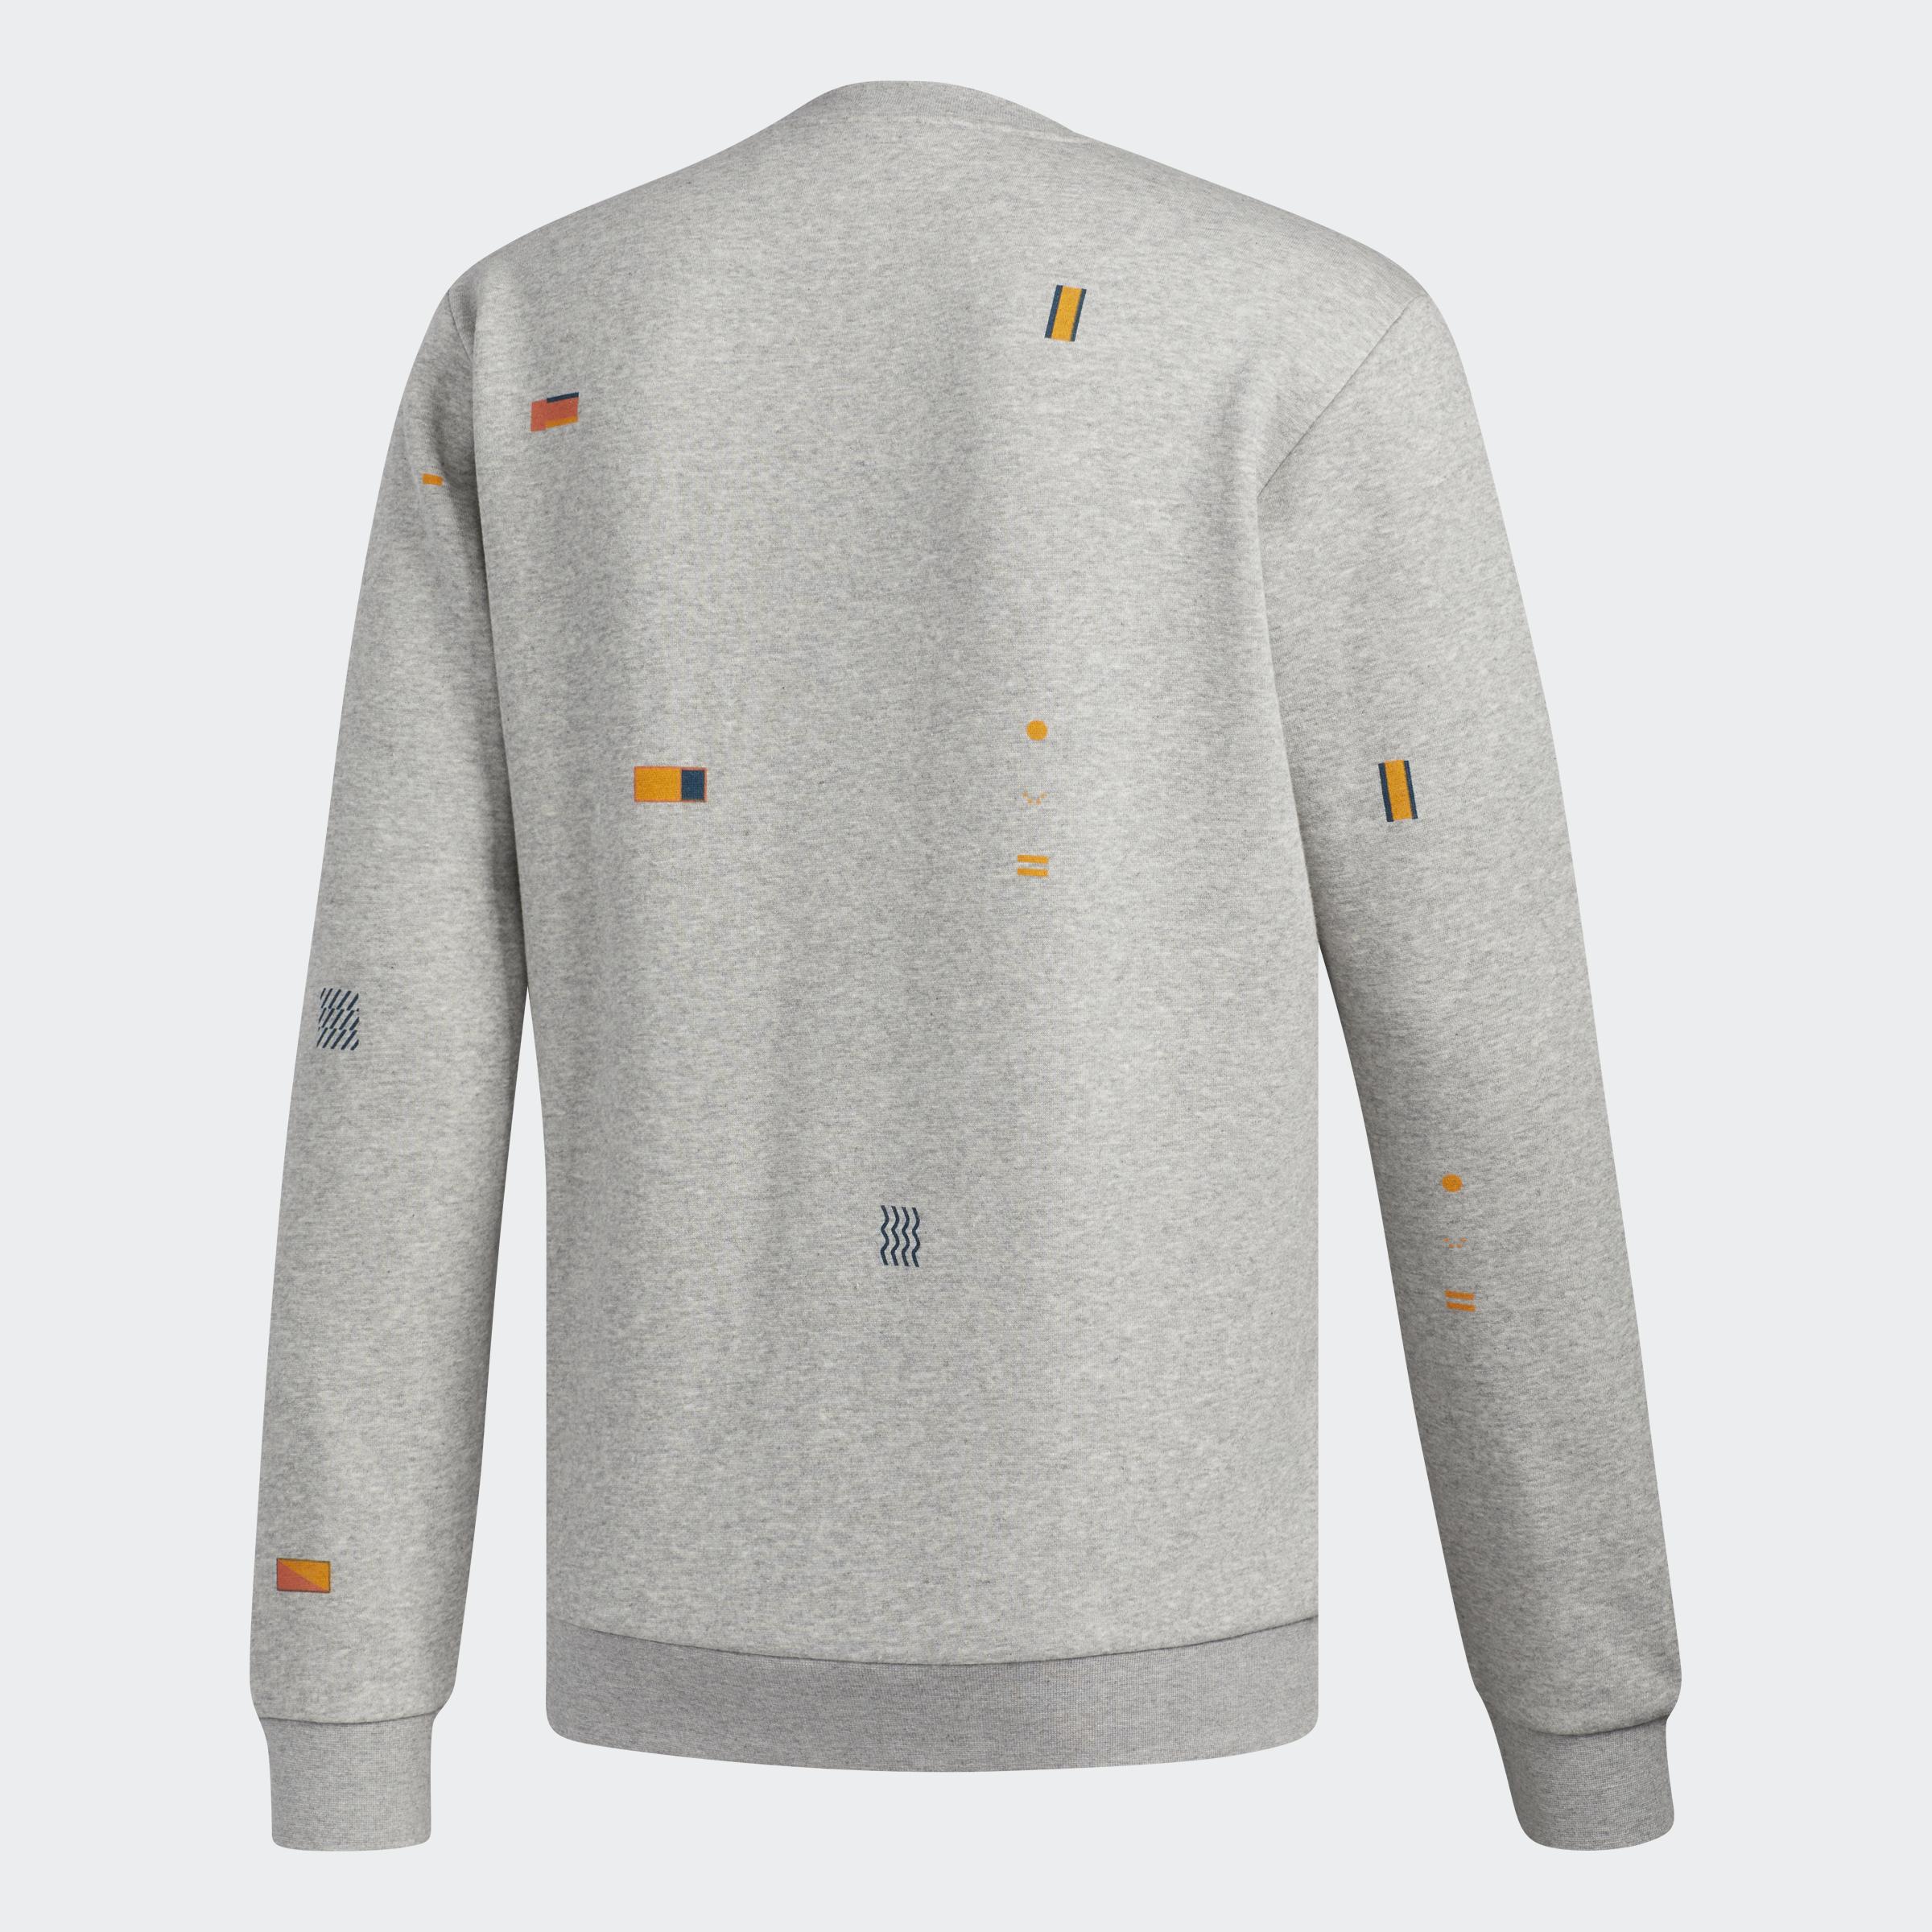 thumbnail 11 - adidas Global Citizens Crew Sweatshirt Men's Sweatshirts